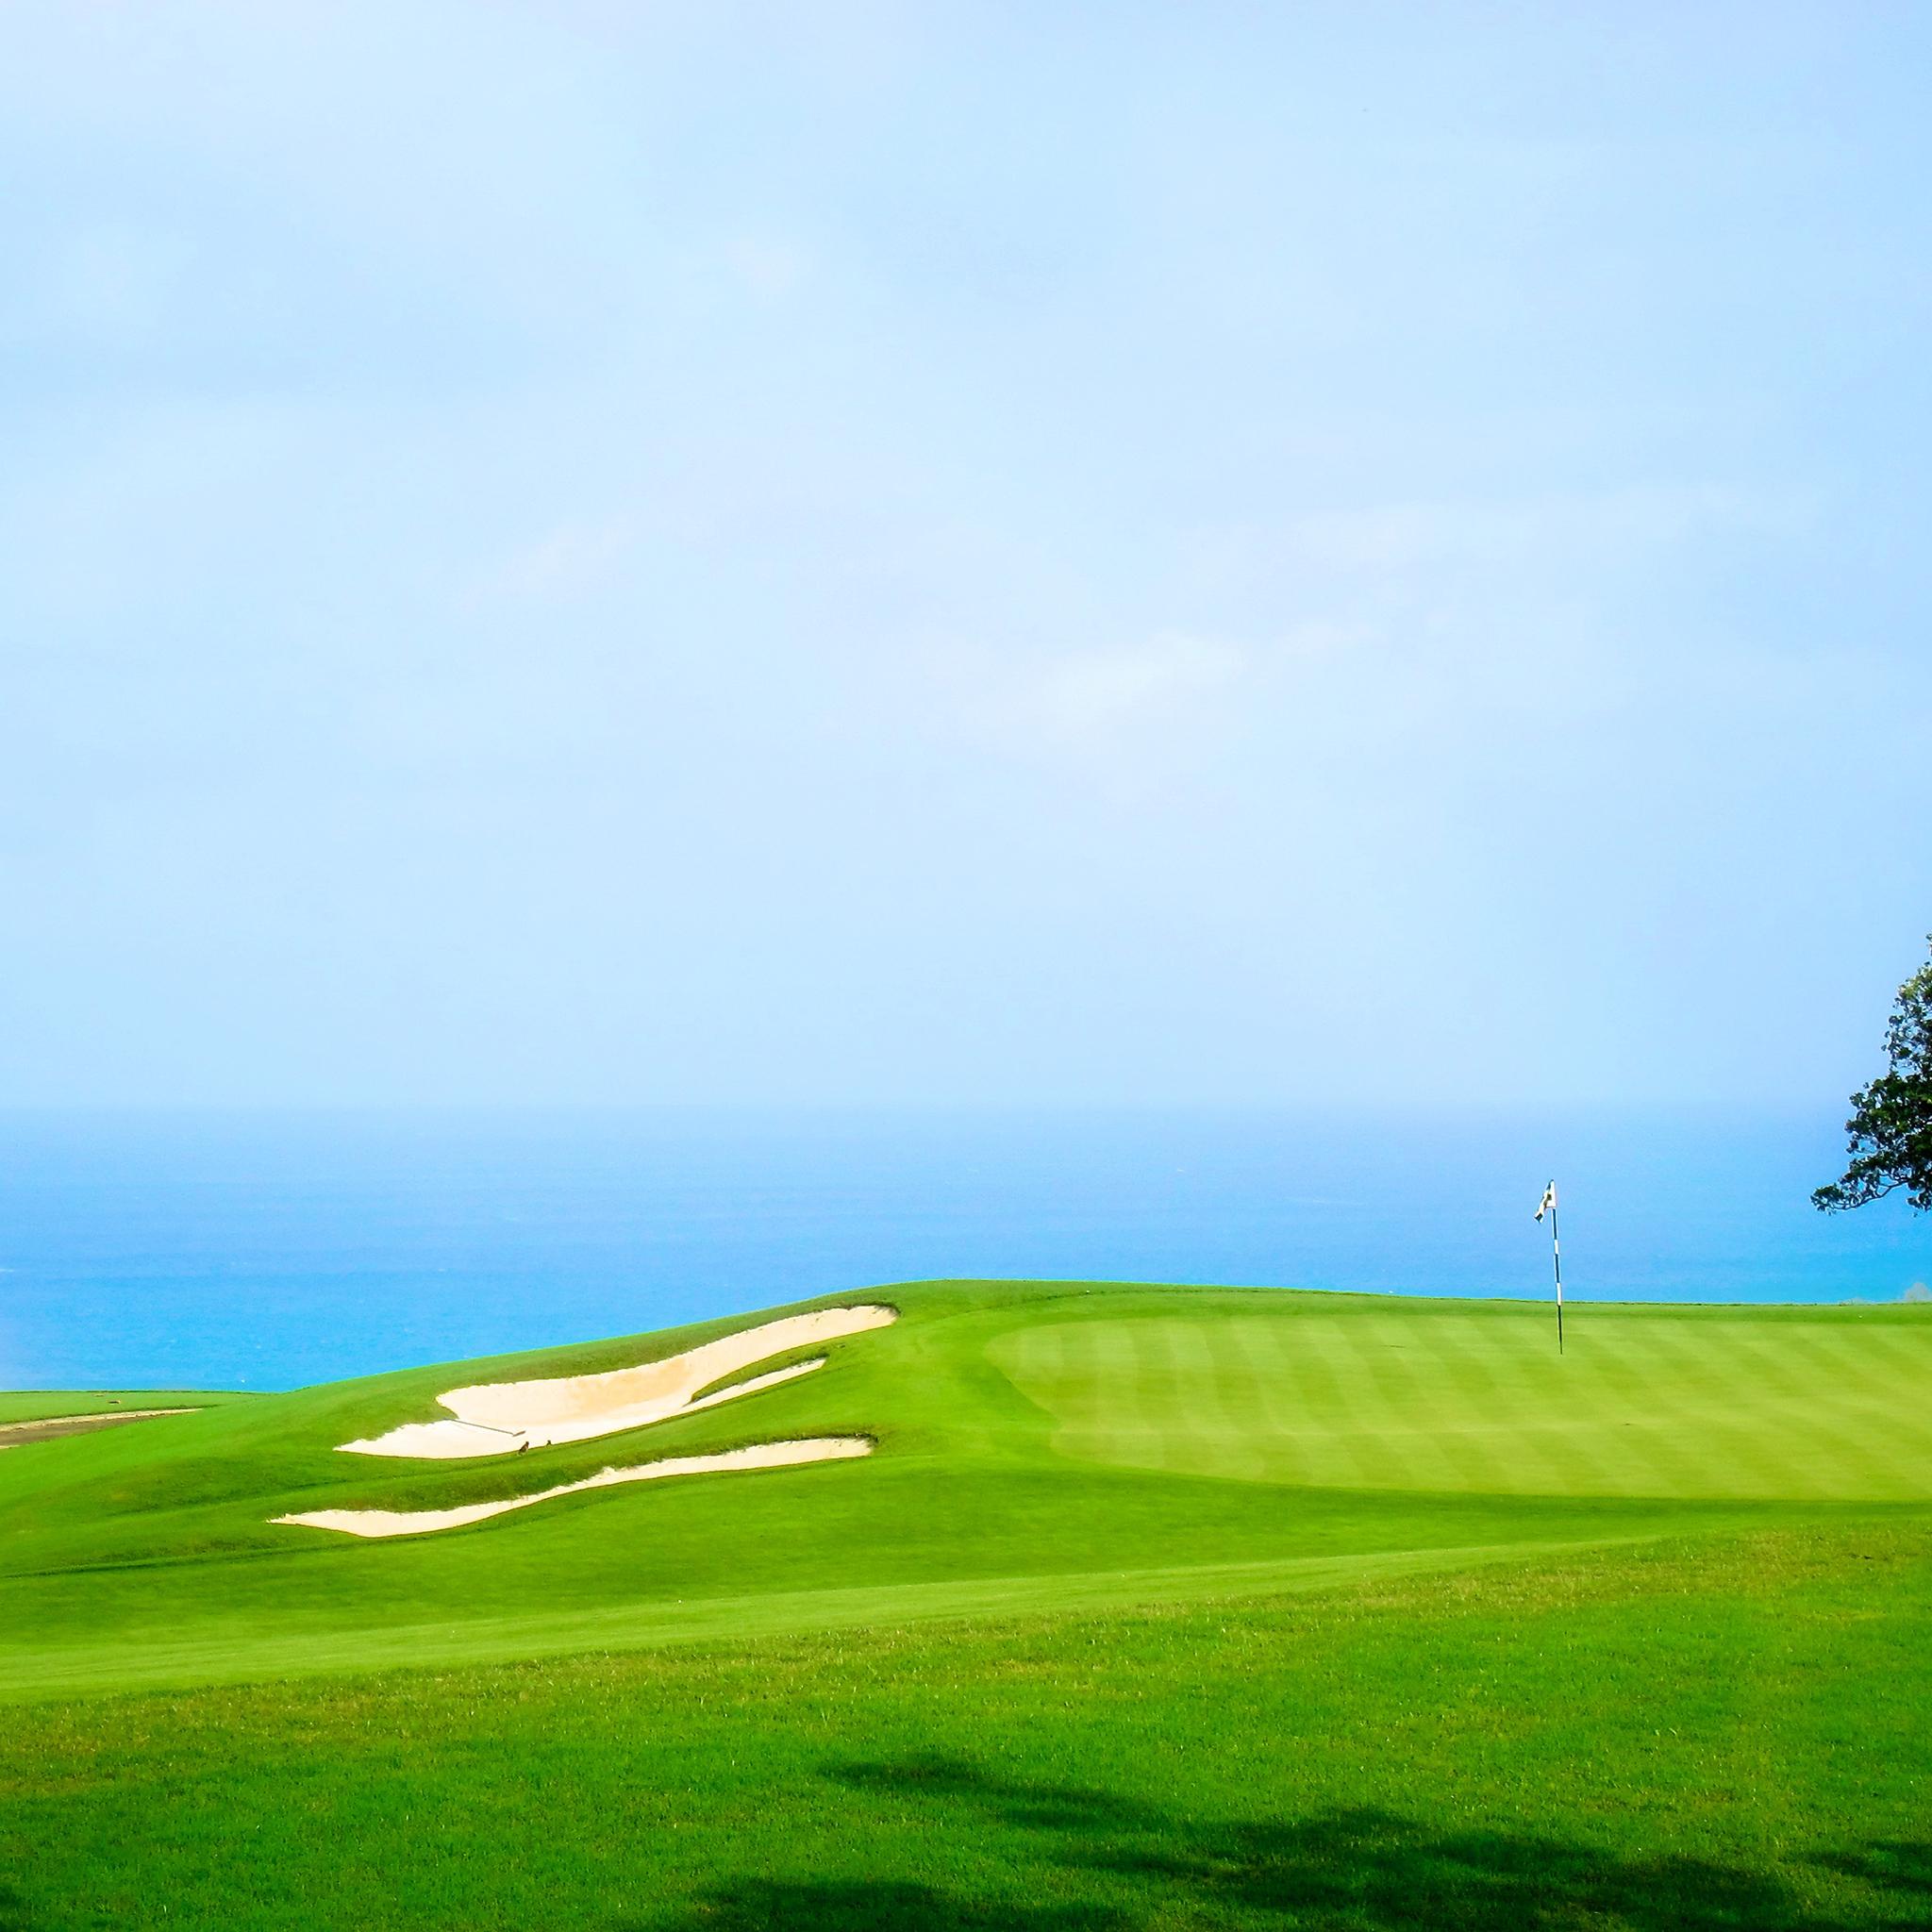 Golfing in Paradise 3Wallpapers iPad Retina Golfing in Paradise   iPad Retina